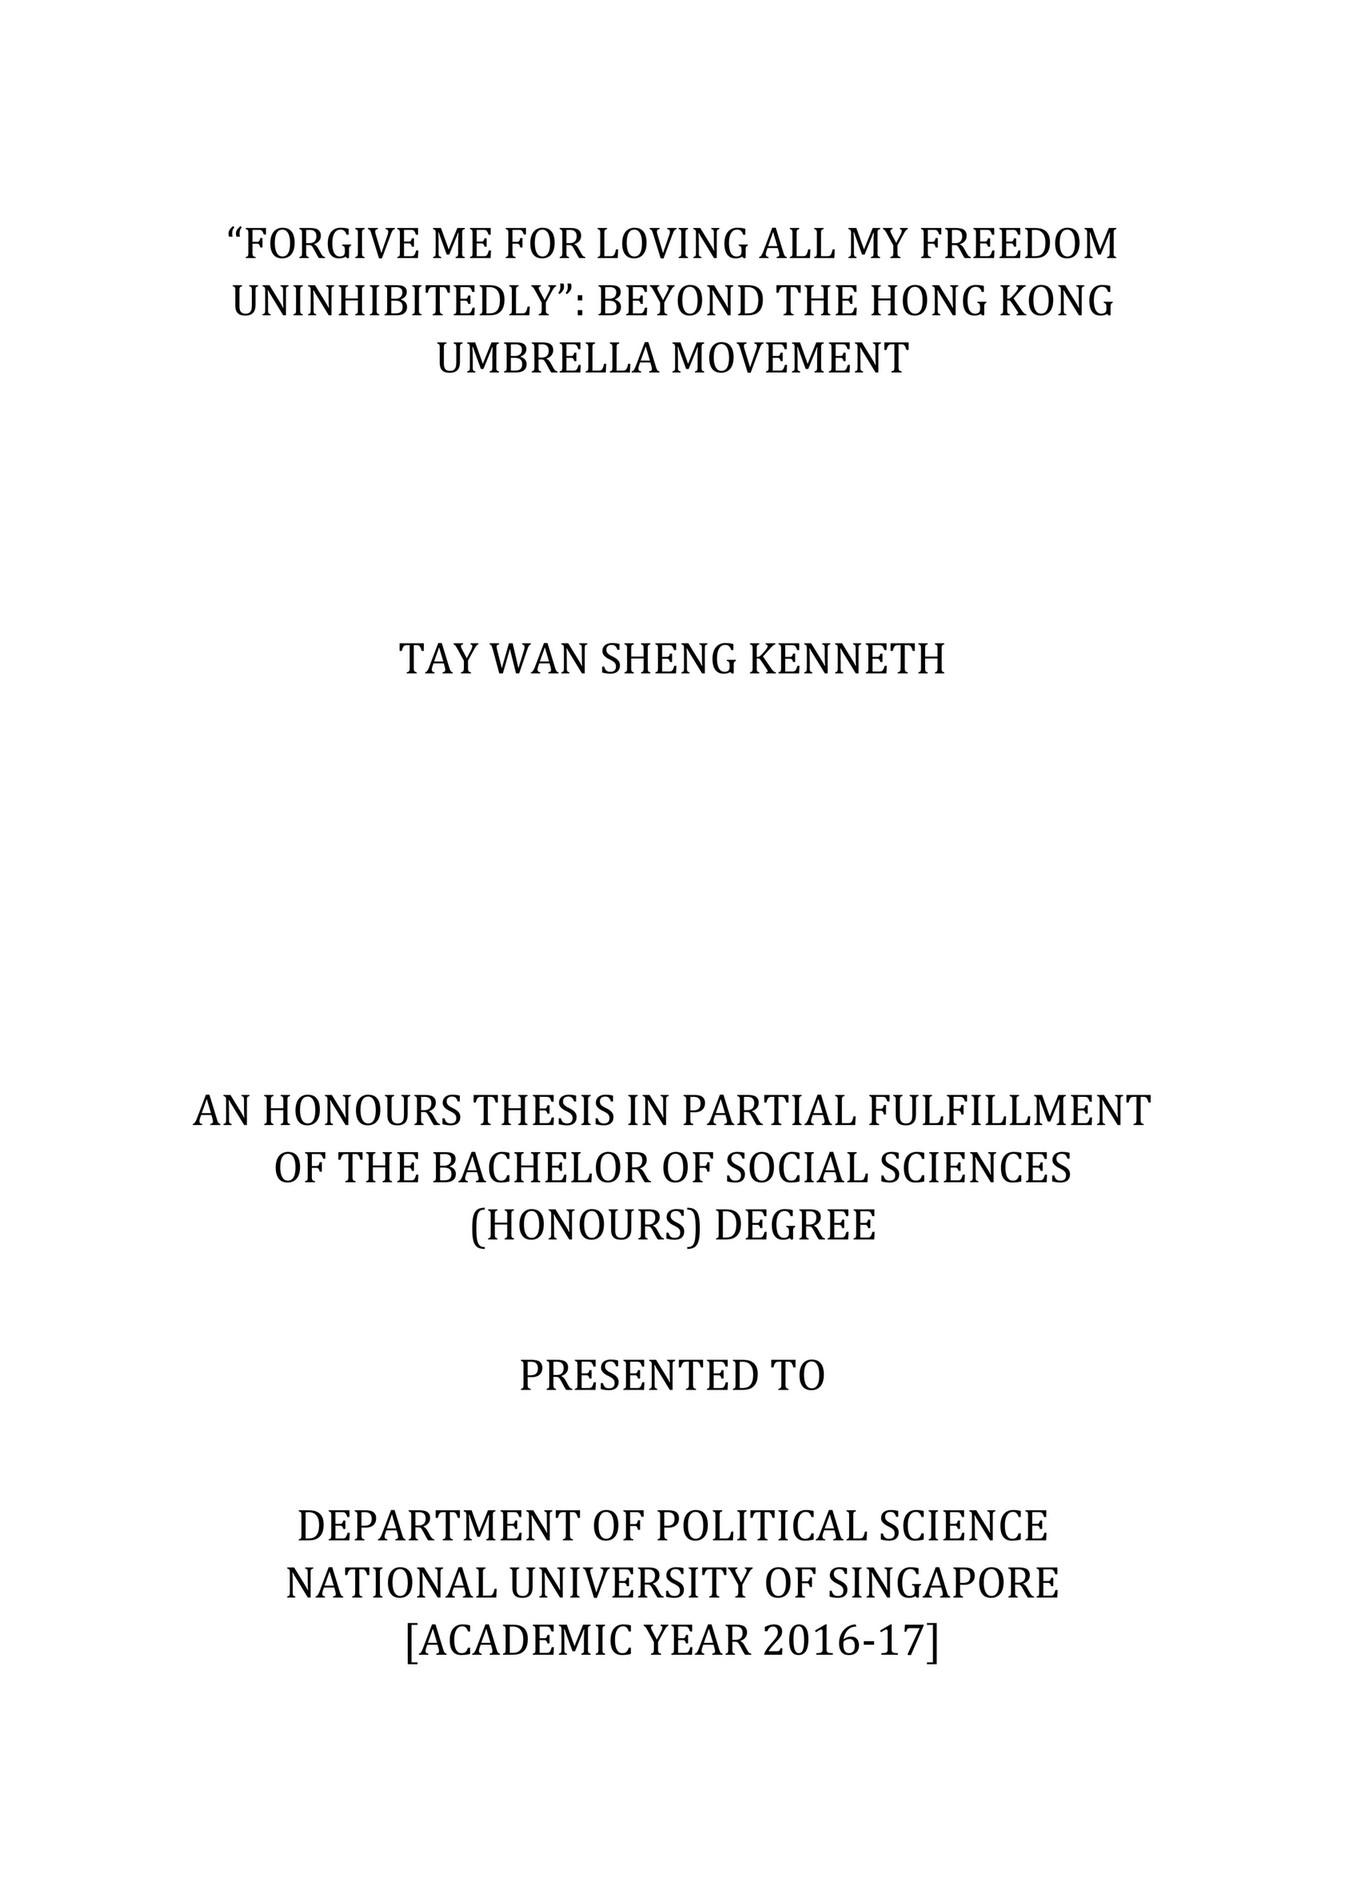 Kenntay.com - Beyond The Hong Kong Umbrella Movement - Page 1 - Created  With Publitas.com